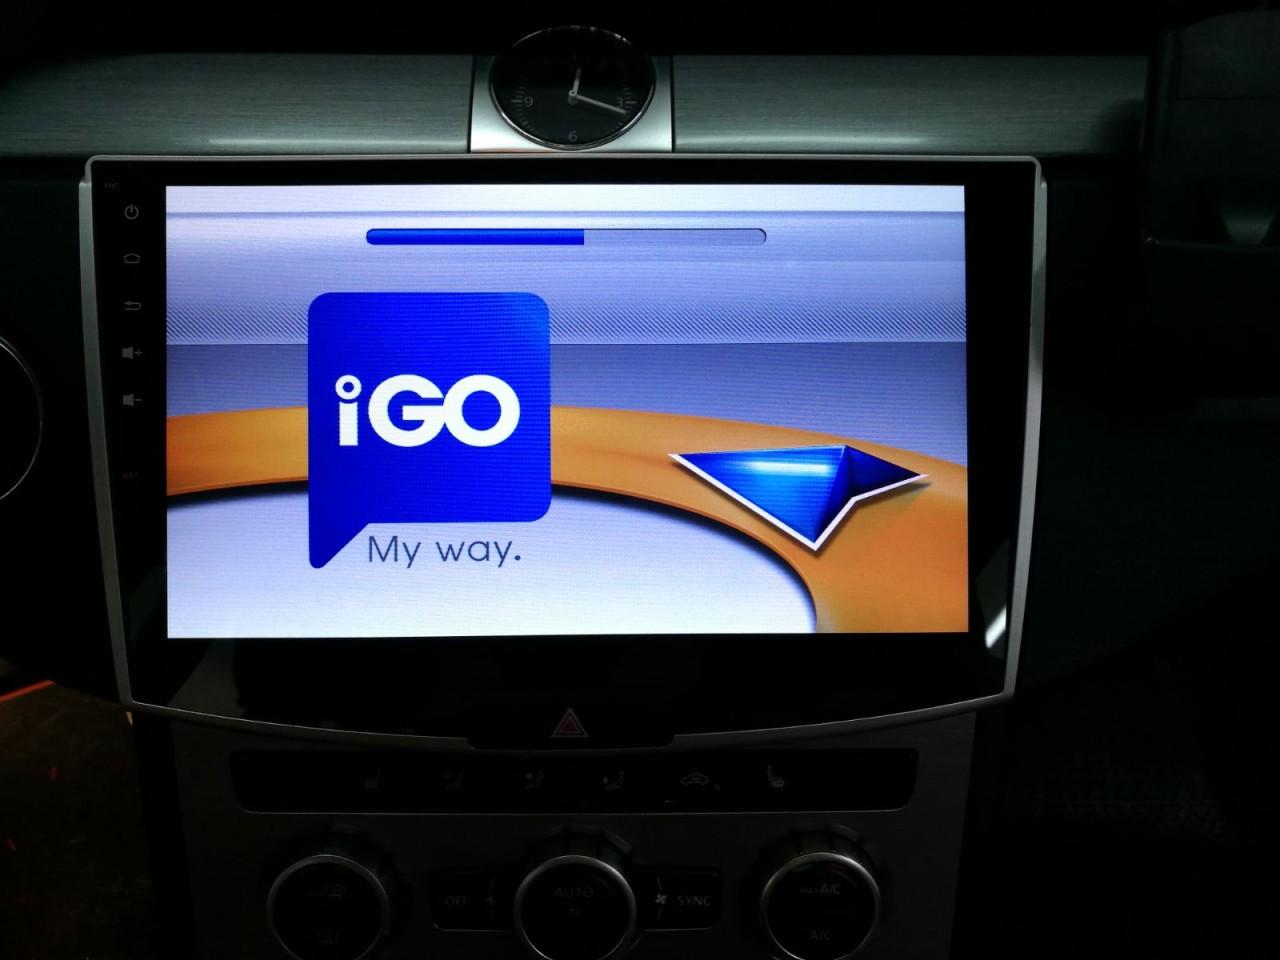 NAVIGATIE CARPAD ANDROID 7.1 DEDICATA VW PASSAT B7 CMP1001T3 TABLETA LCD 10.1'' INTERNET 4G DVR WAZE